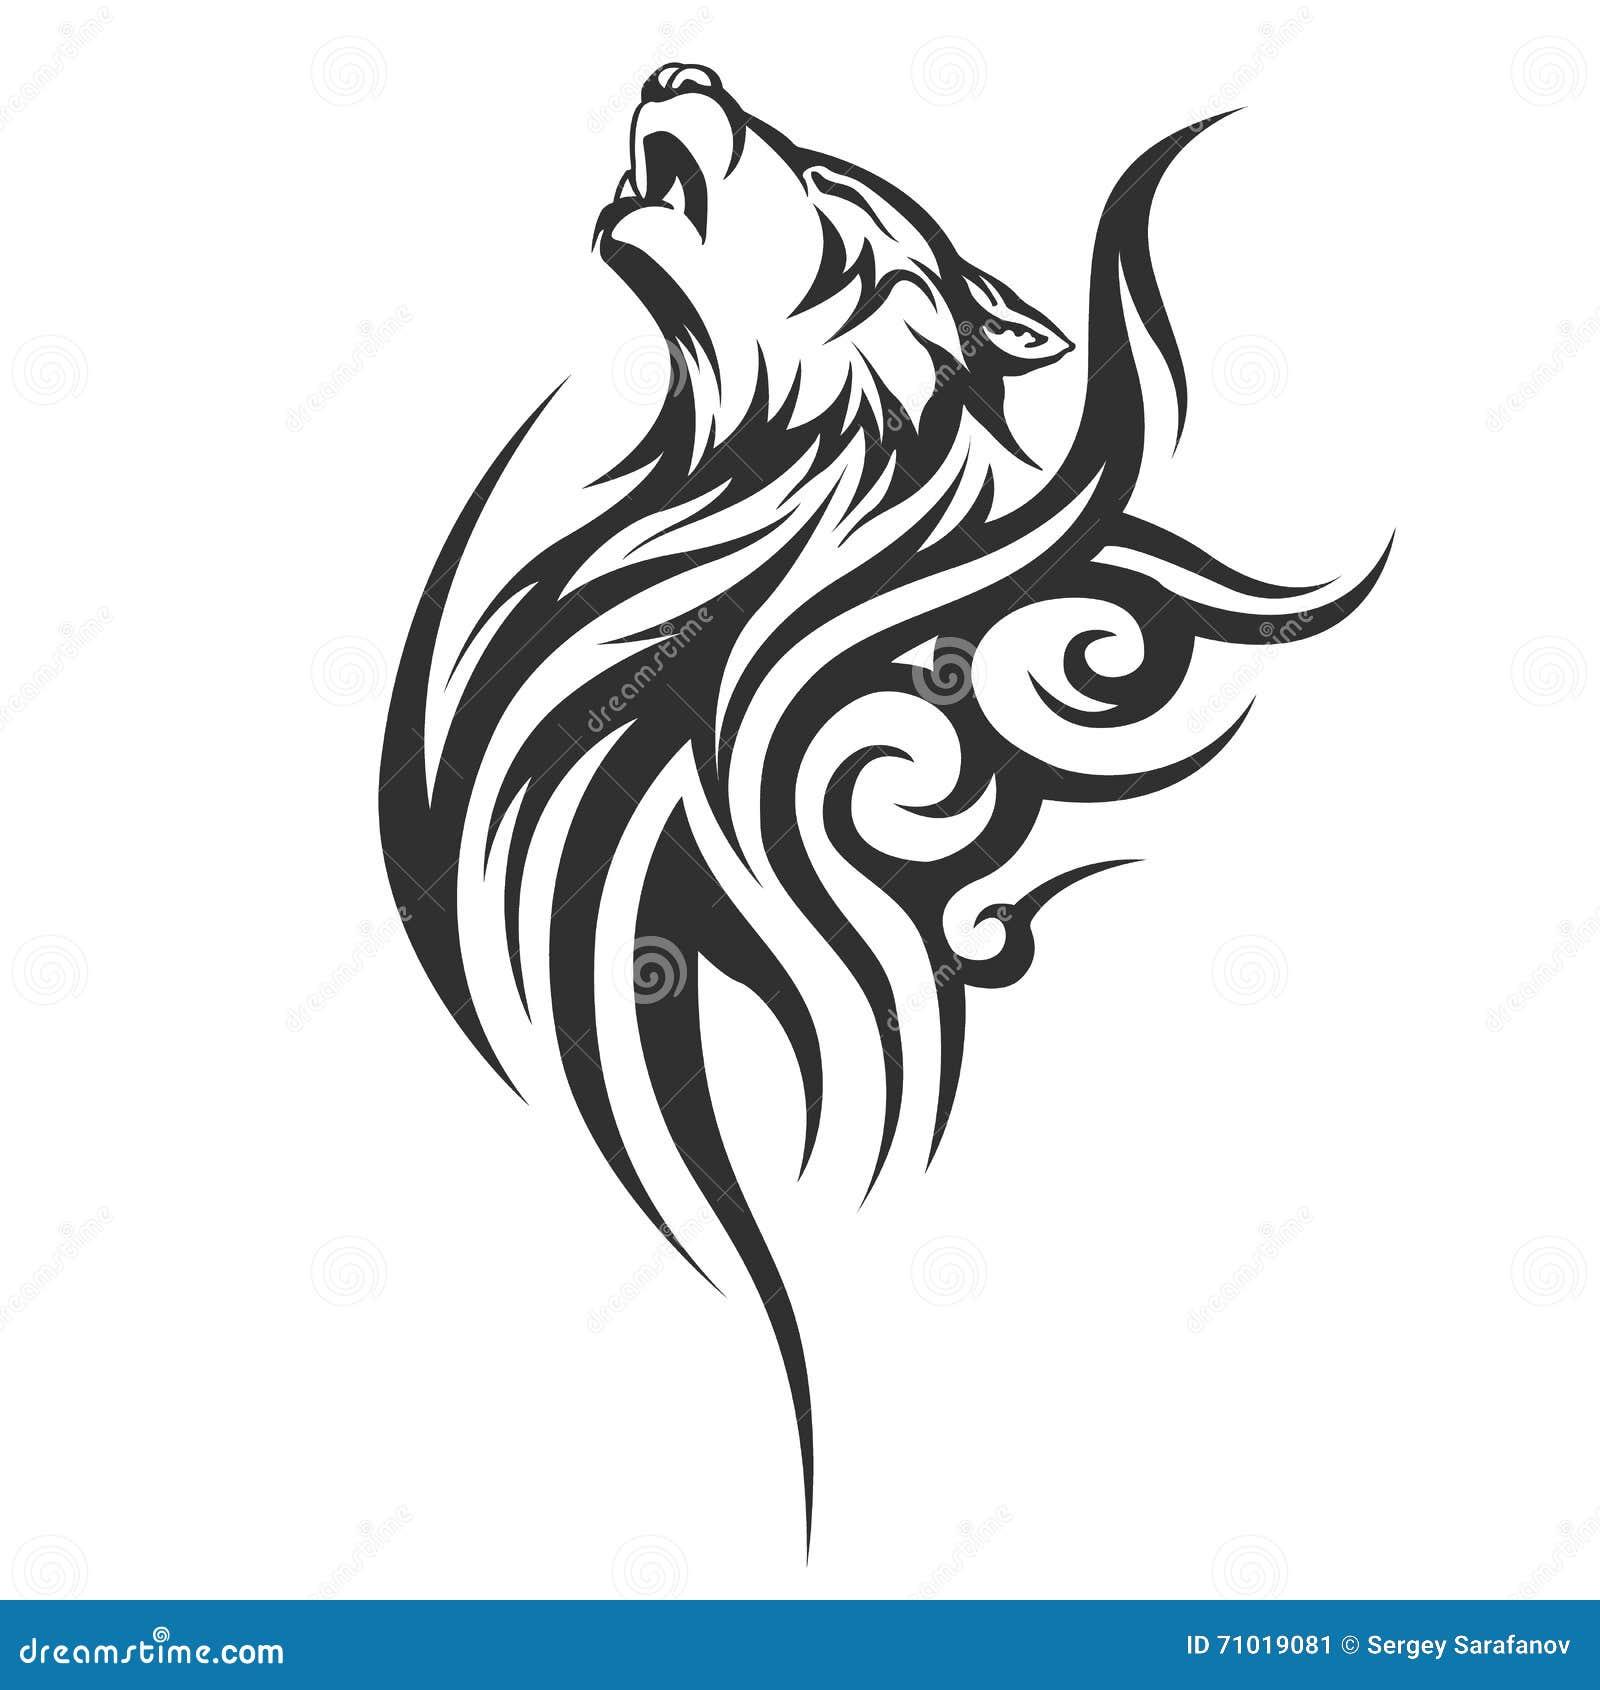 Tribal Tattoo Wolf Designs Stock Vector. Illustration Of